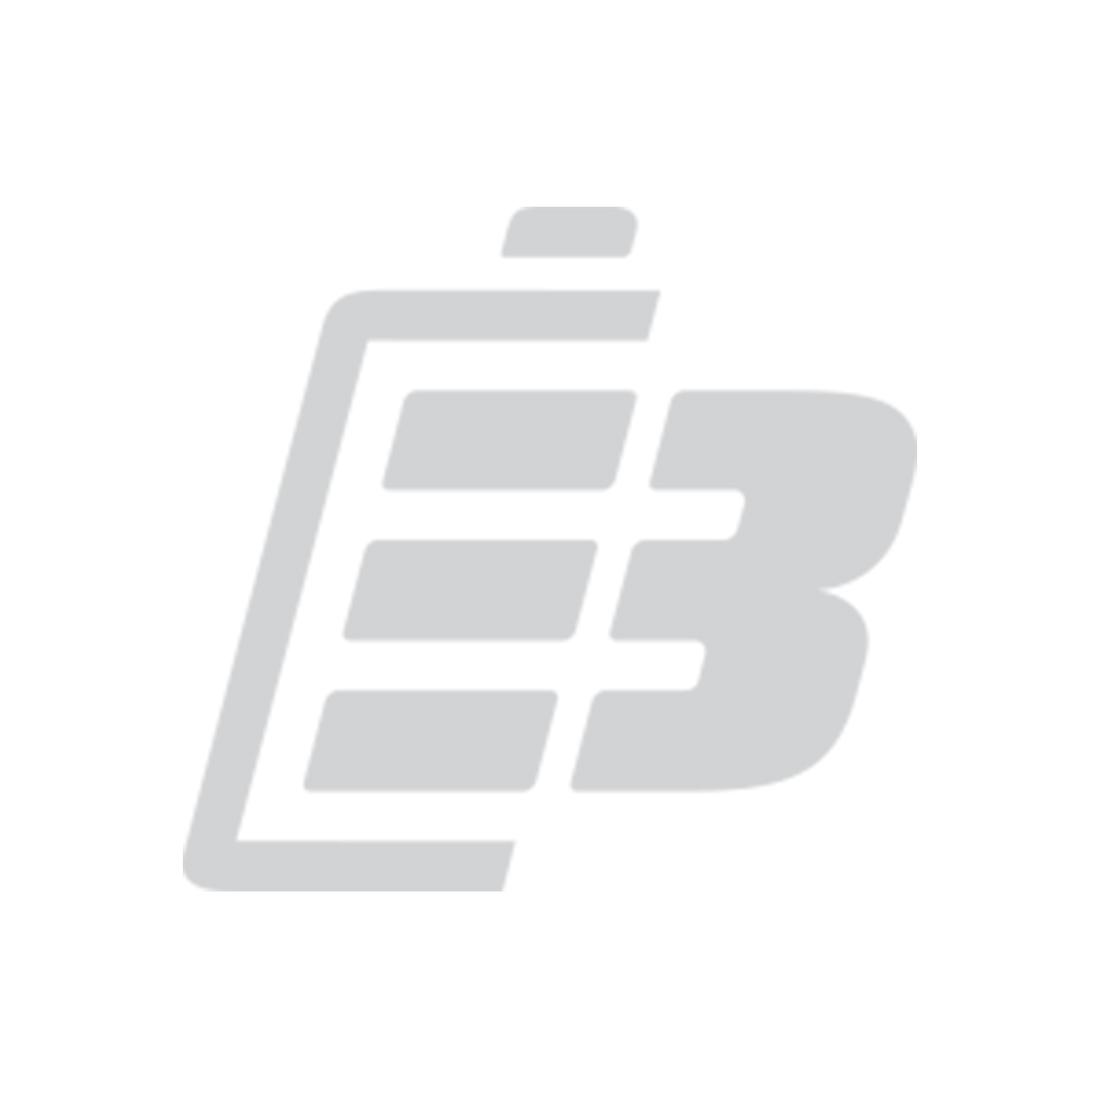 Wireless router battery ZTE MF90 Hotspot_1